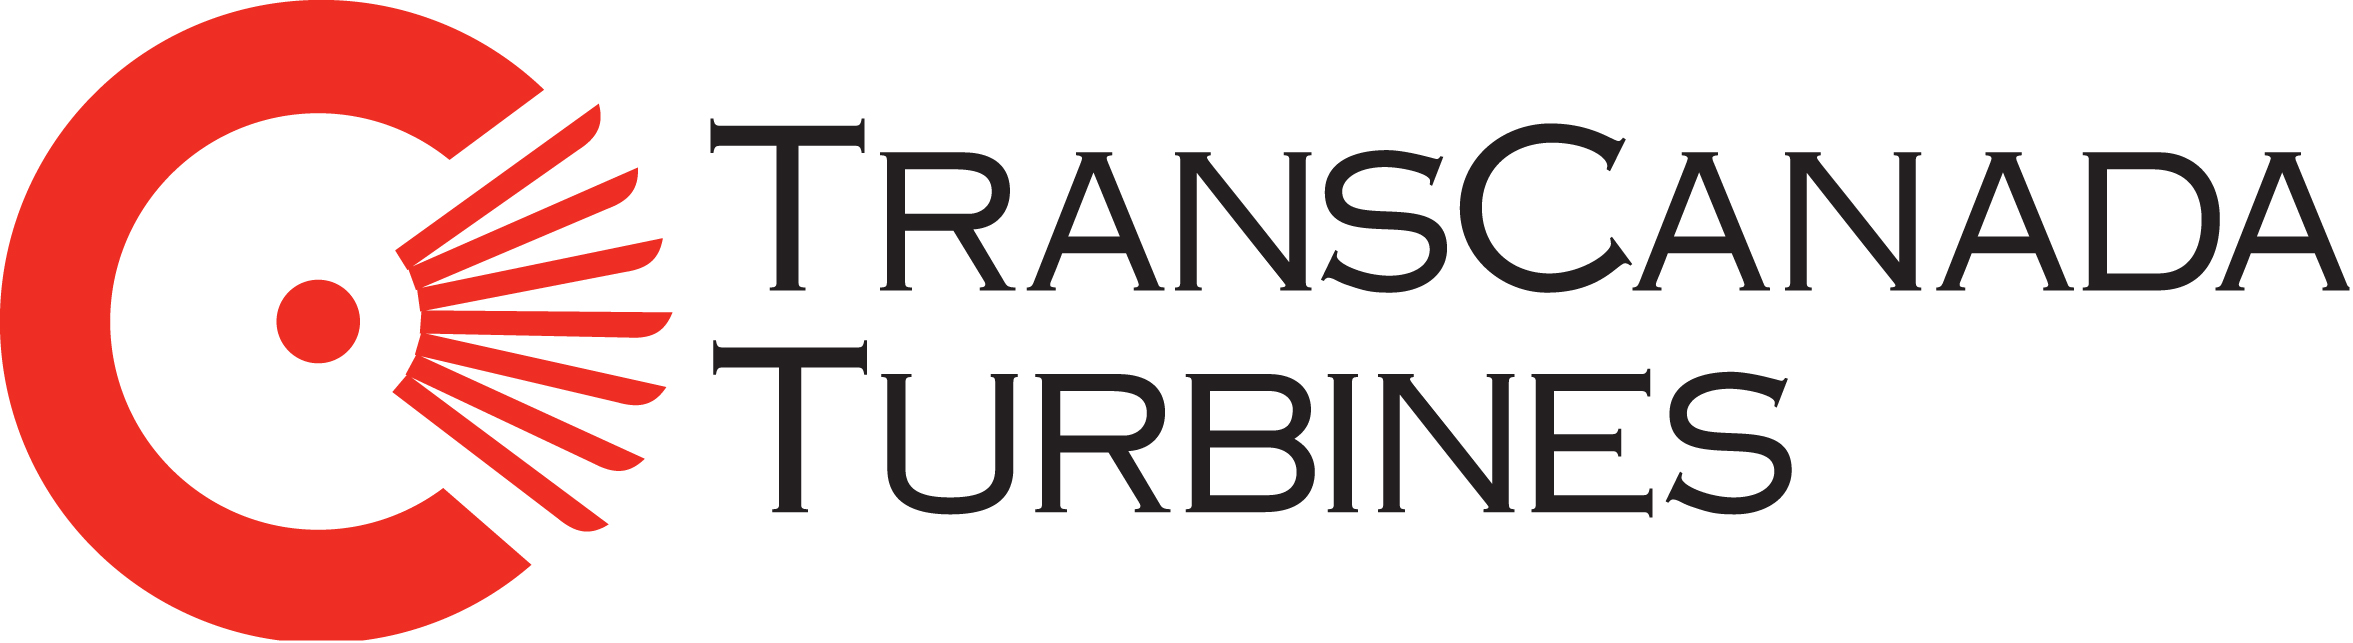 TransCanada Turbines Logo